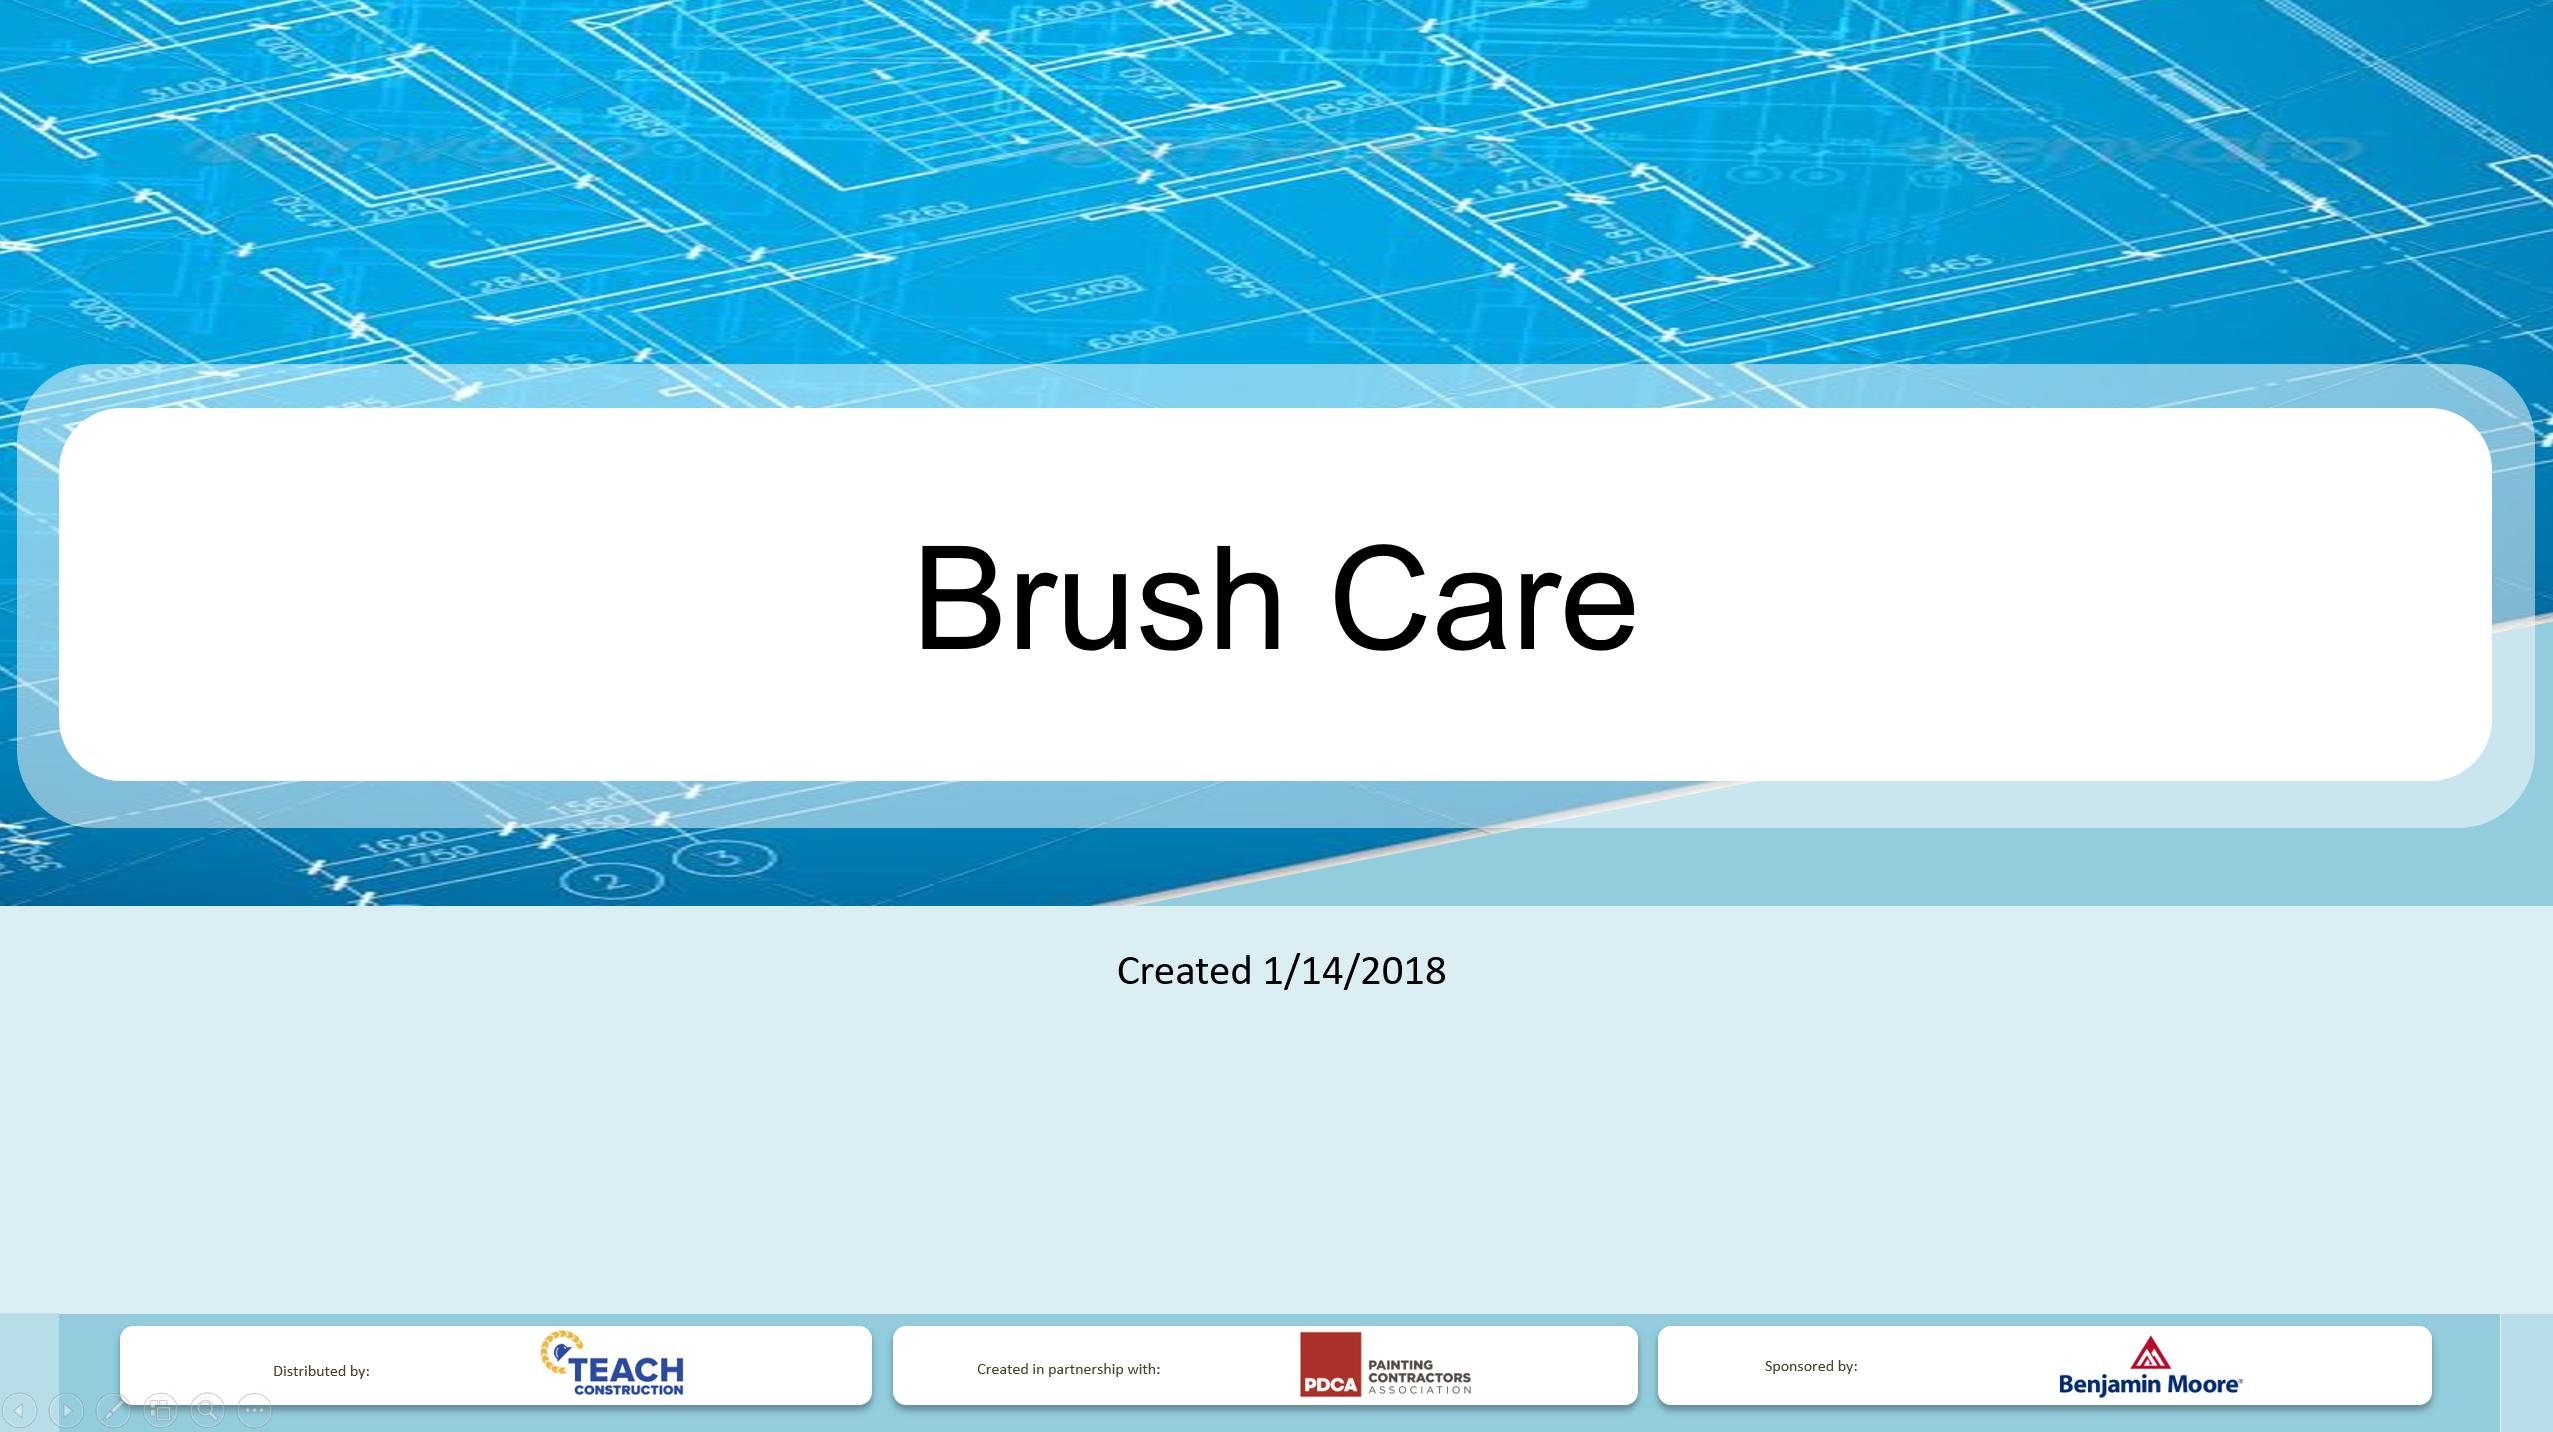 Paint Brush Care - Presentation Image